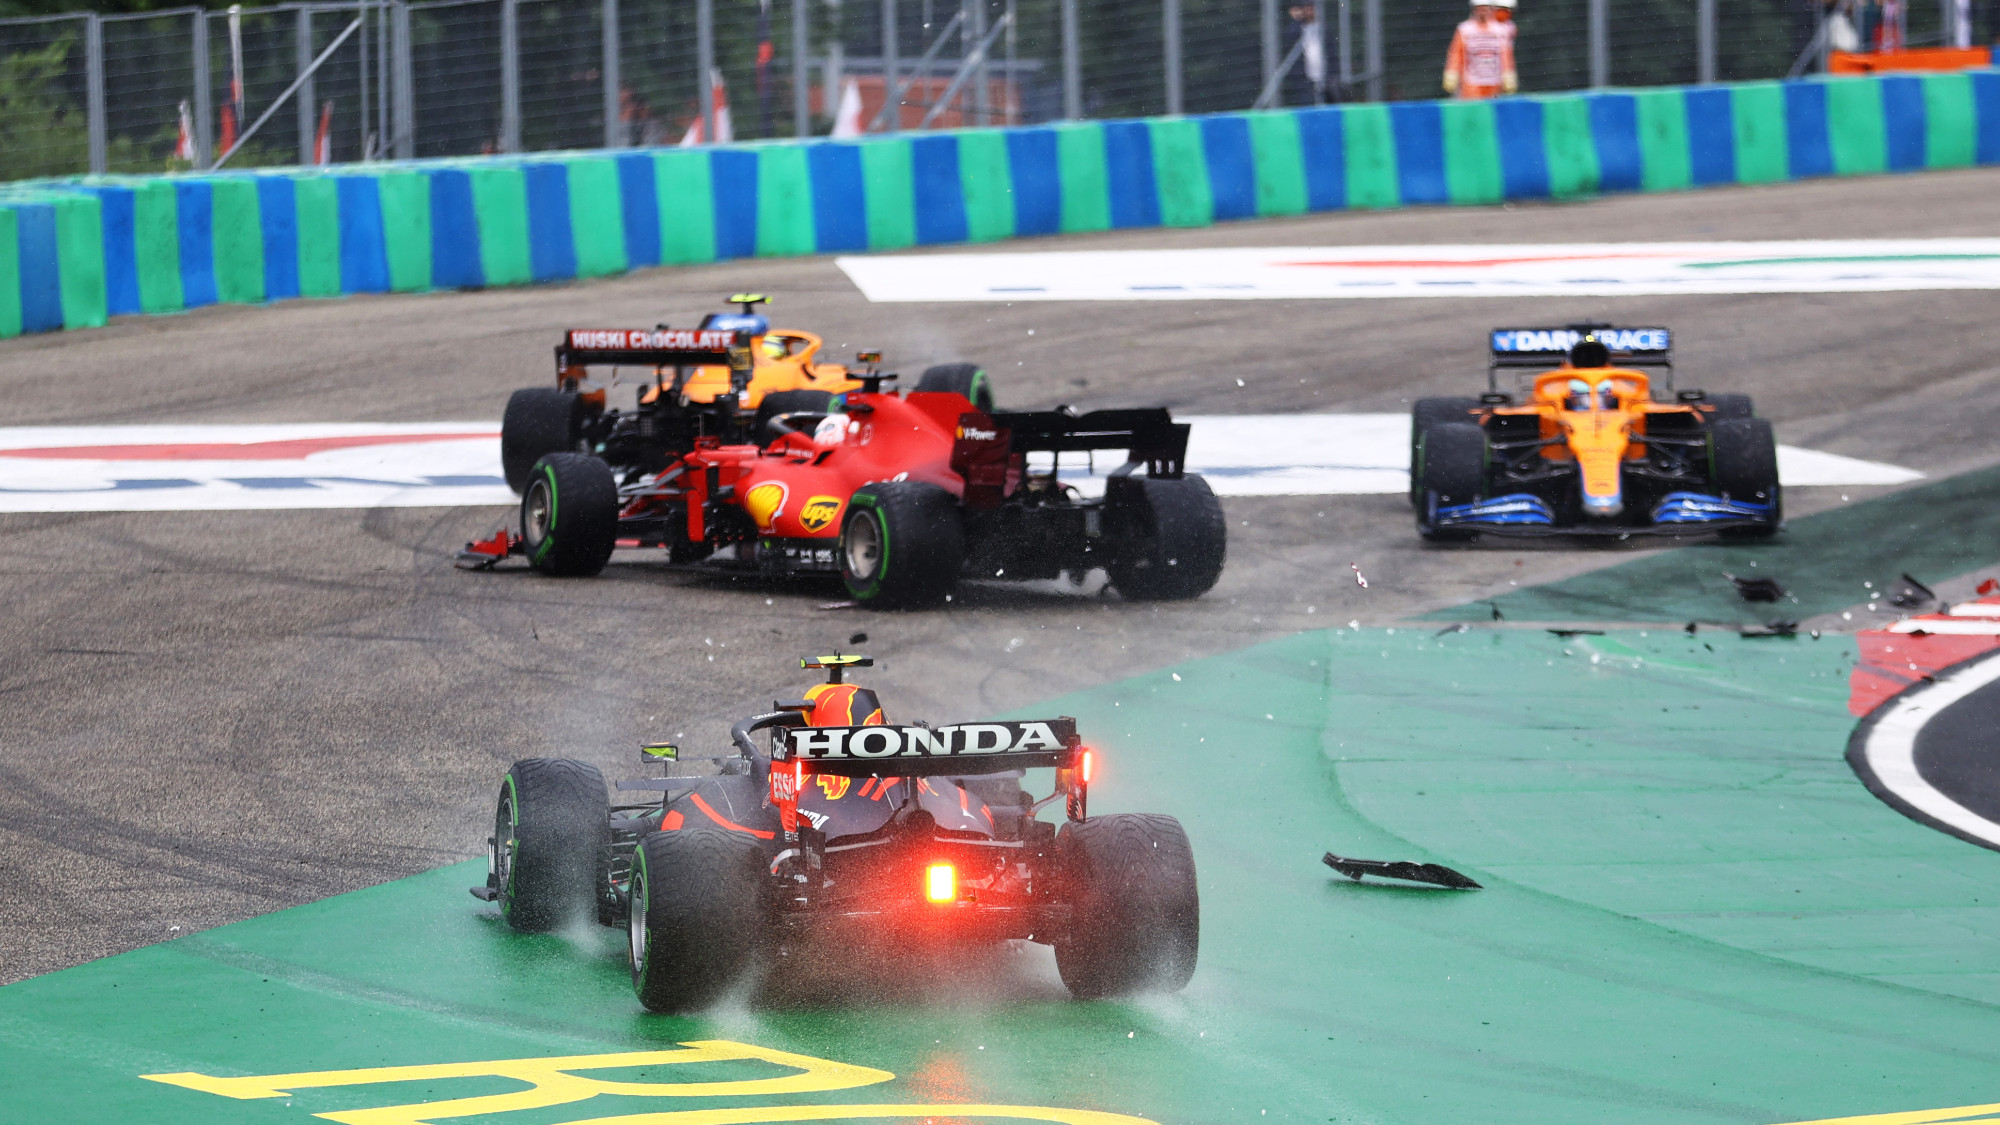 Hungarian GP 2021 Race Start